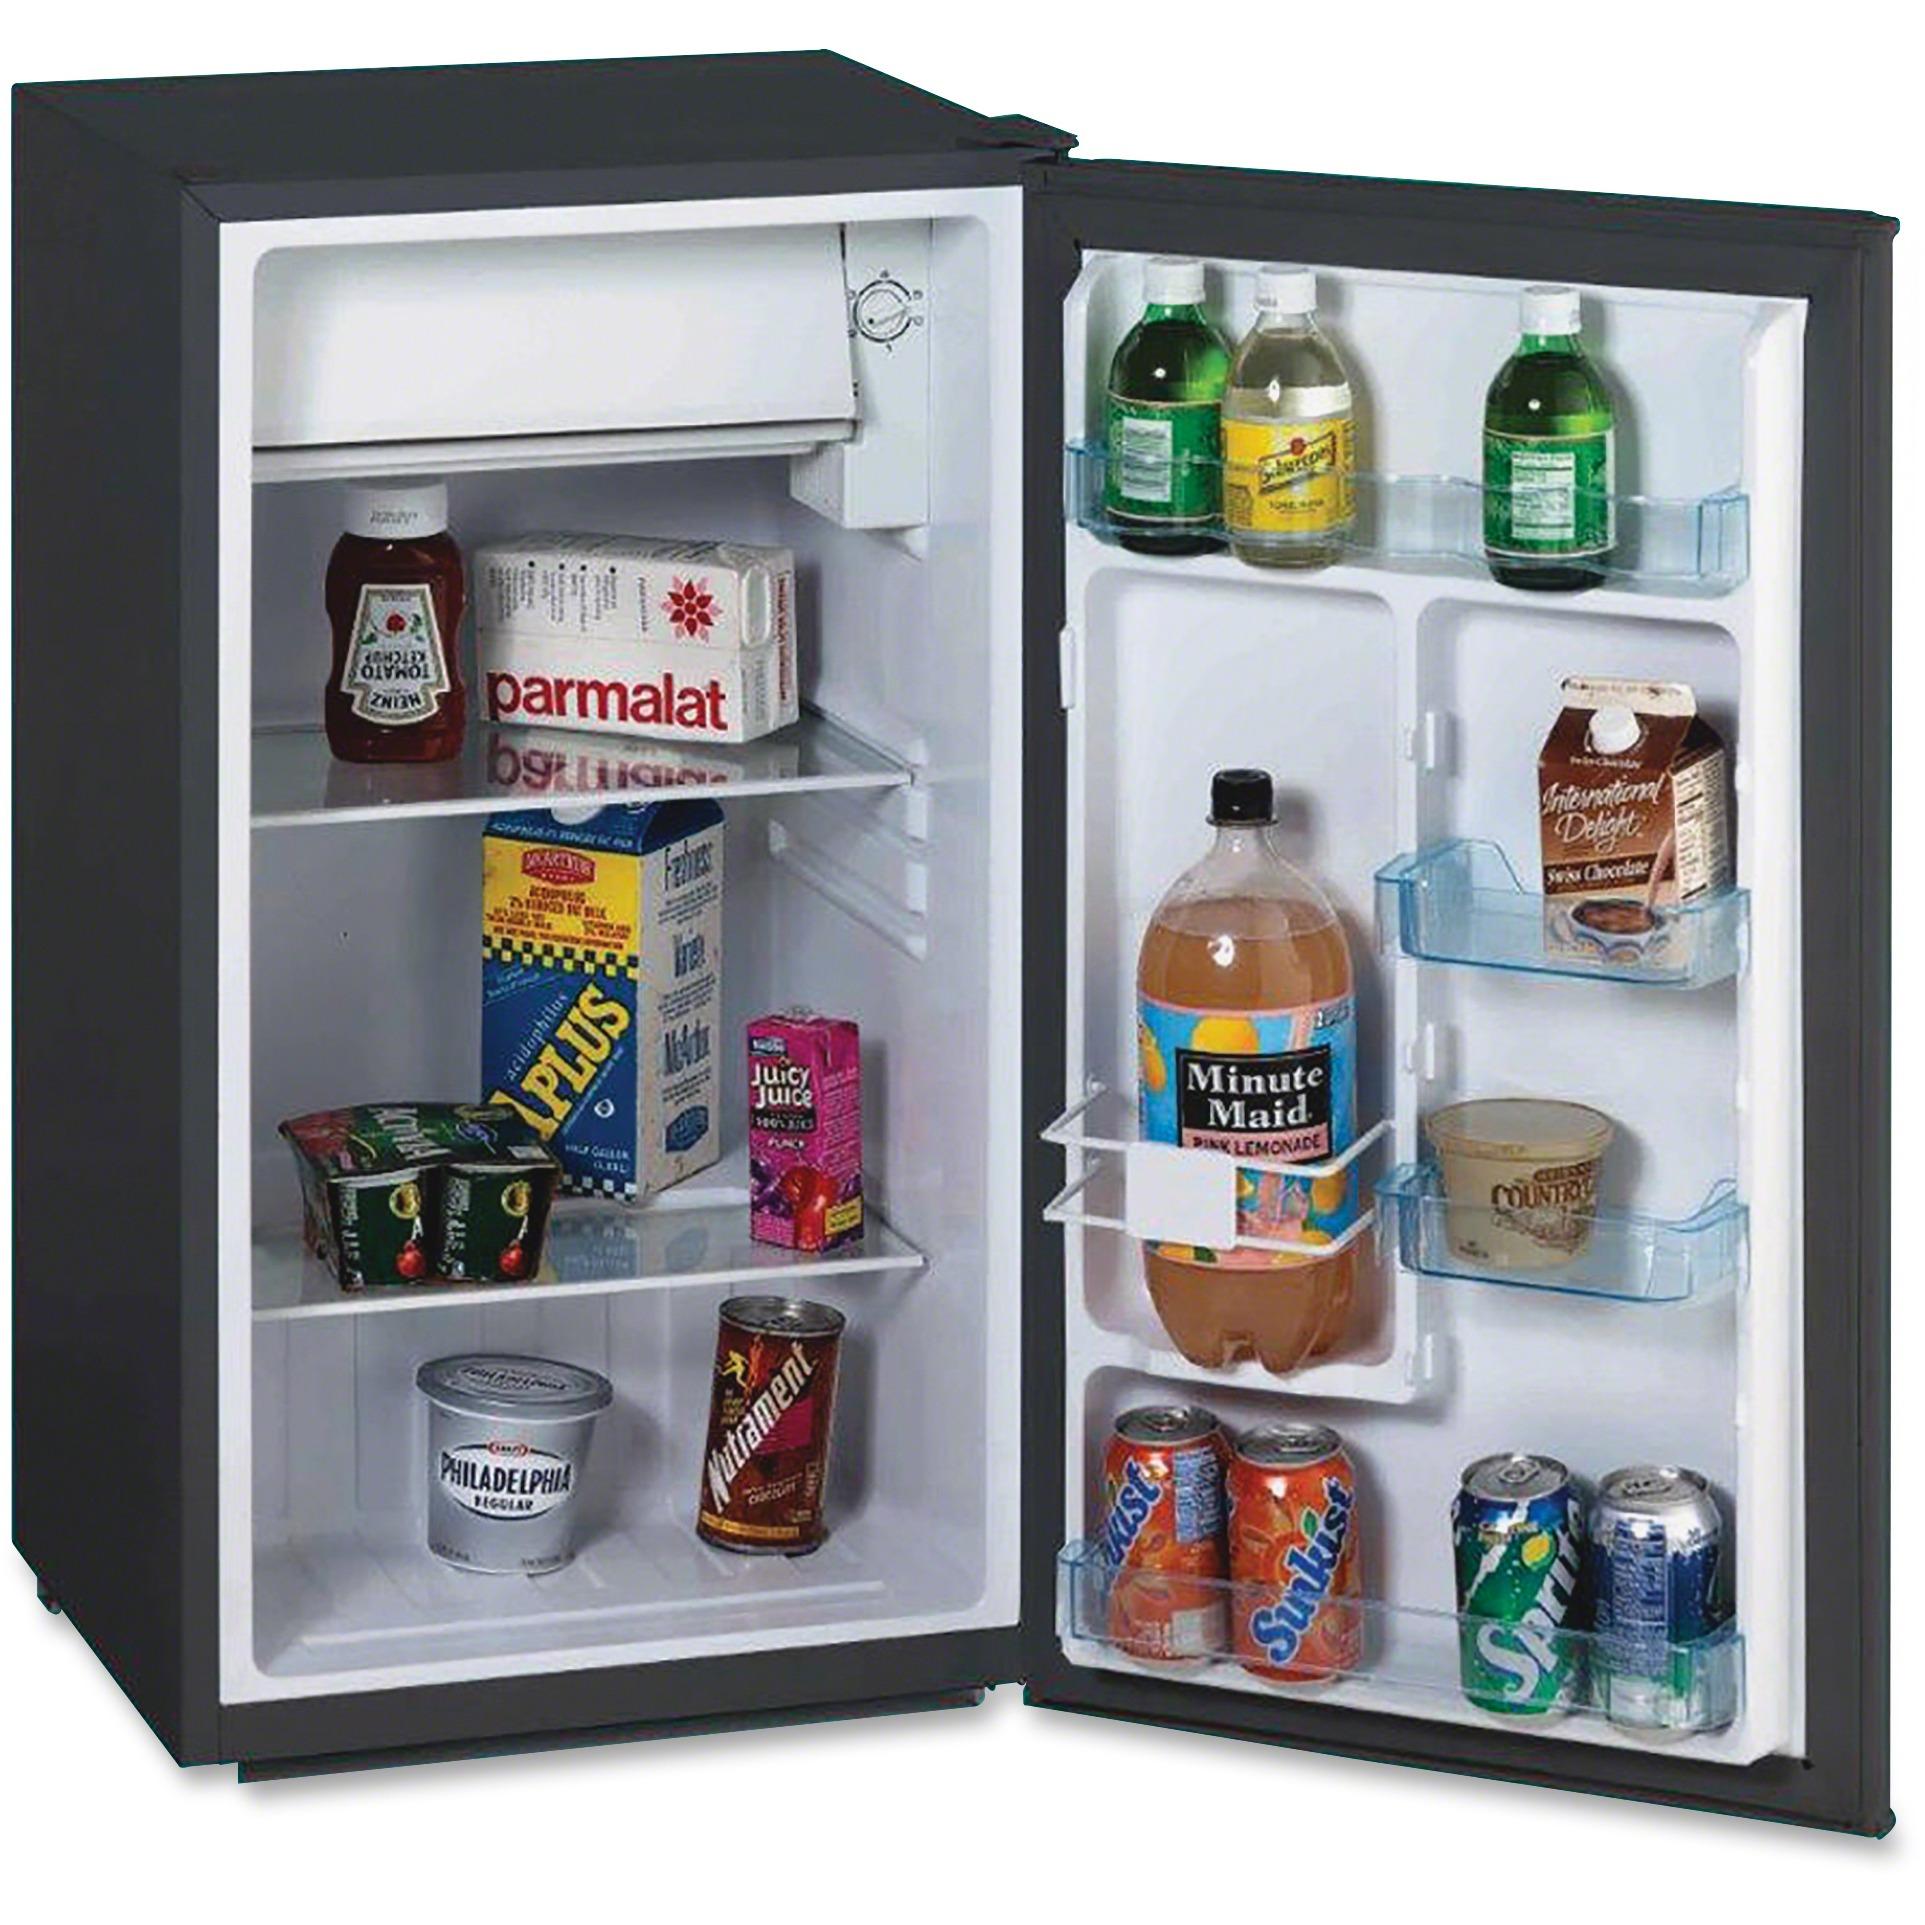 Avanti RM3316B 3.3 Cu Ft Compact Refrigerator, Black